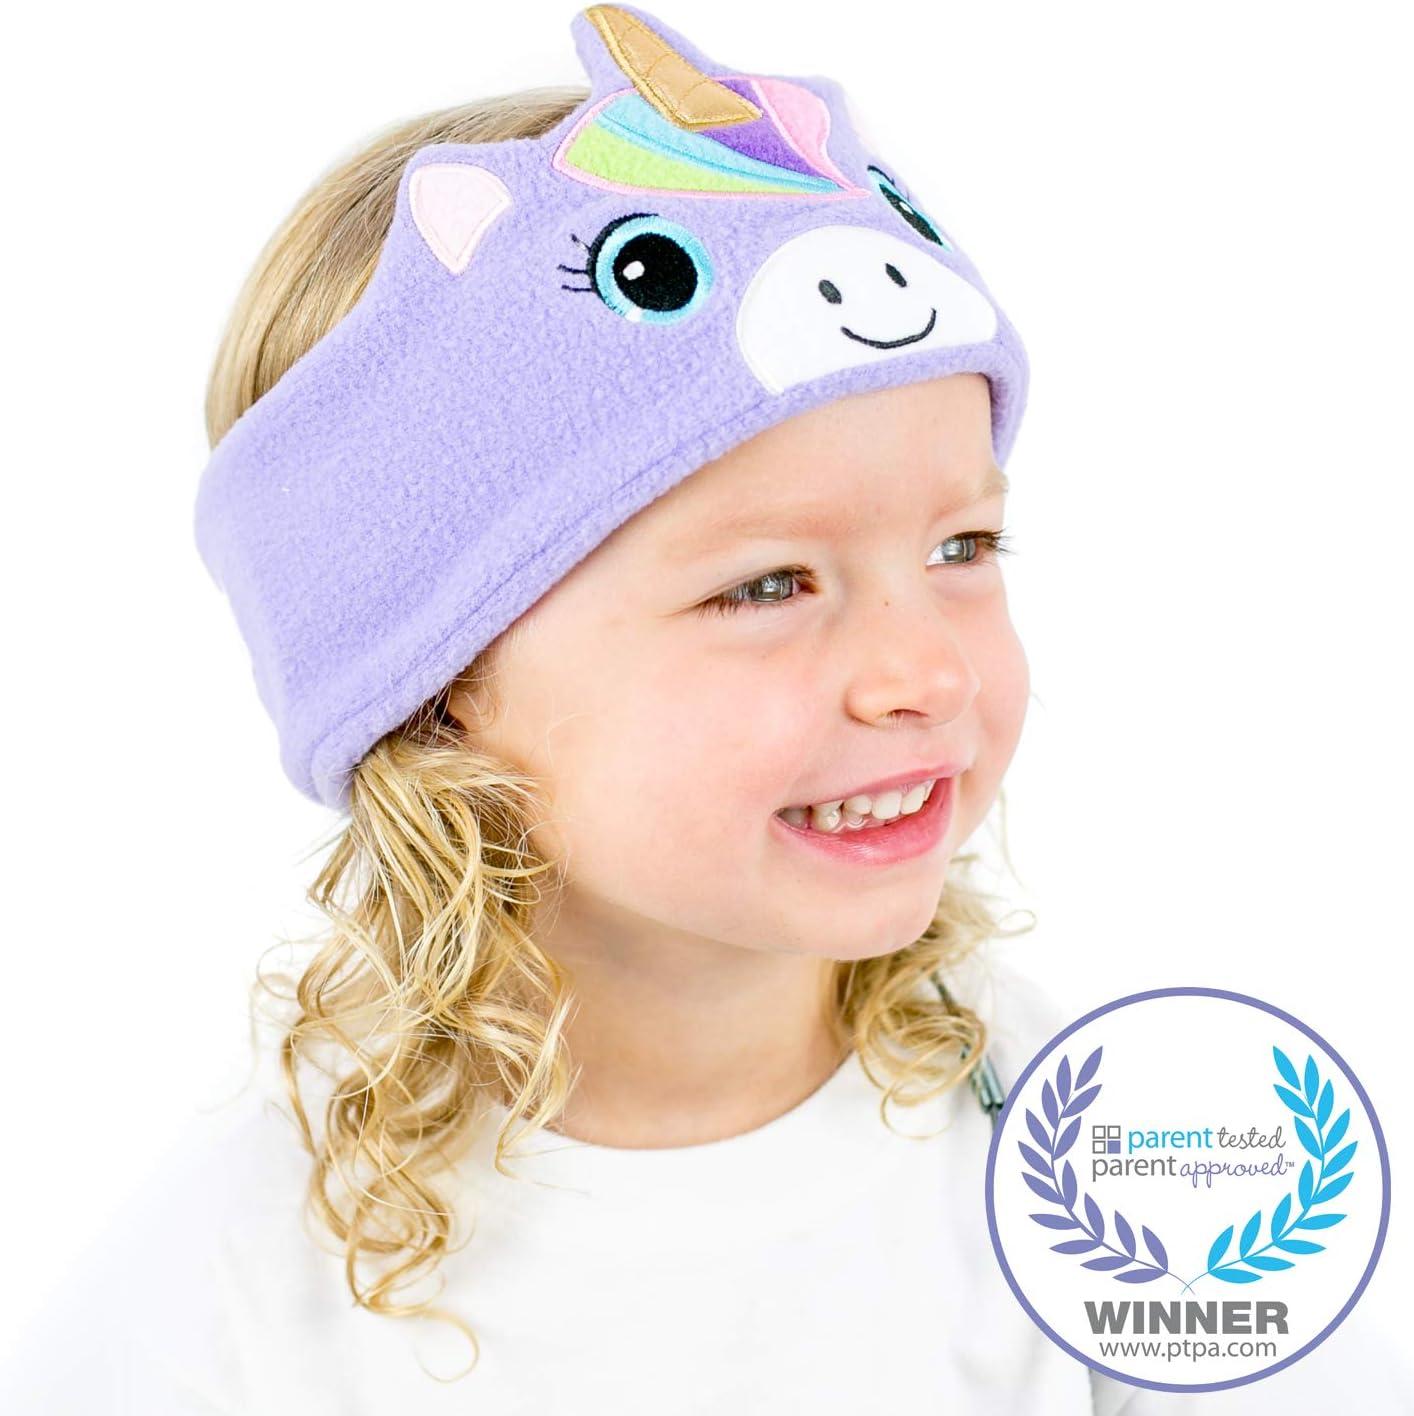 CozyPhones Kids Headphones Volume Limited with Ultra-Thin Speakers Soft Fleece Headband - Perfect Children's Earphones for Home and Travel - Purple Rainbow Unicorn